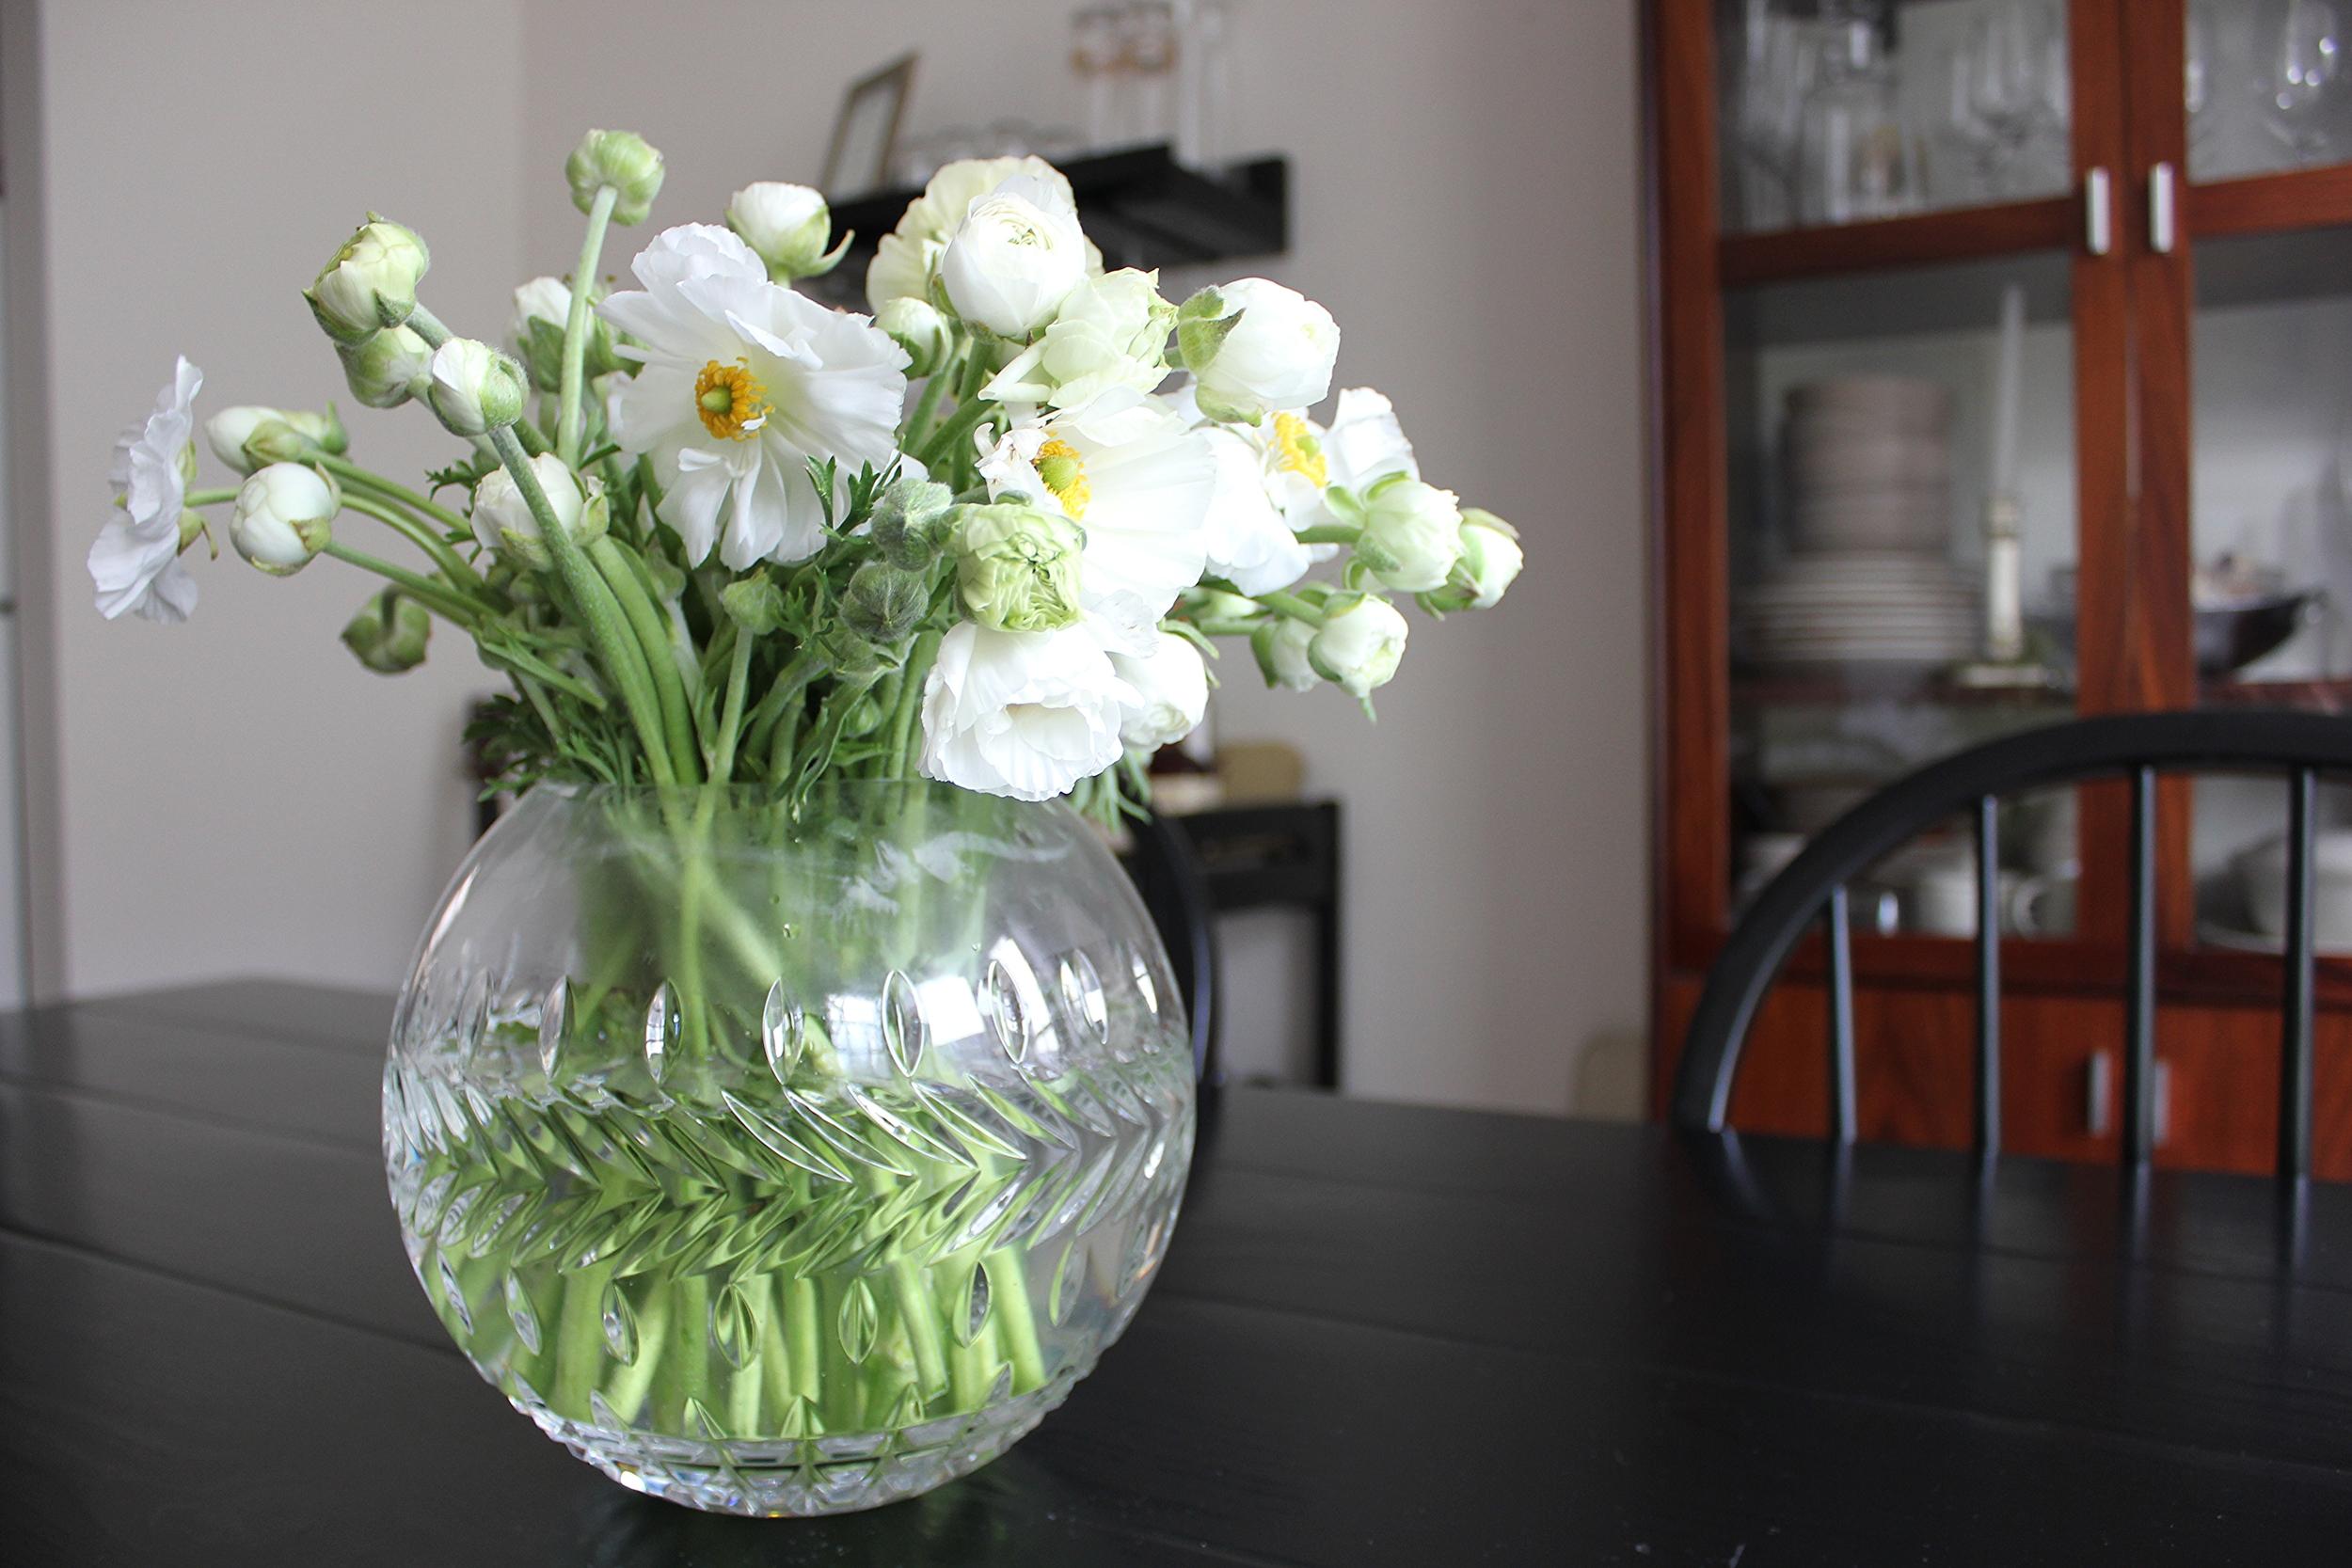 White ranunculus in a crystal vase